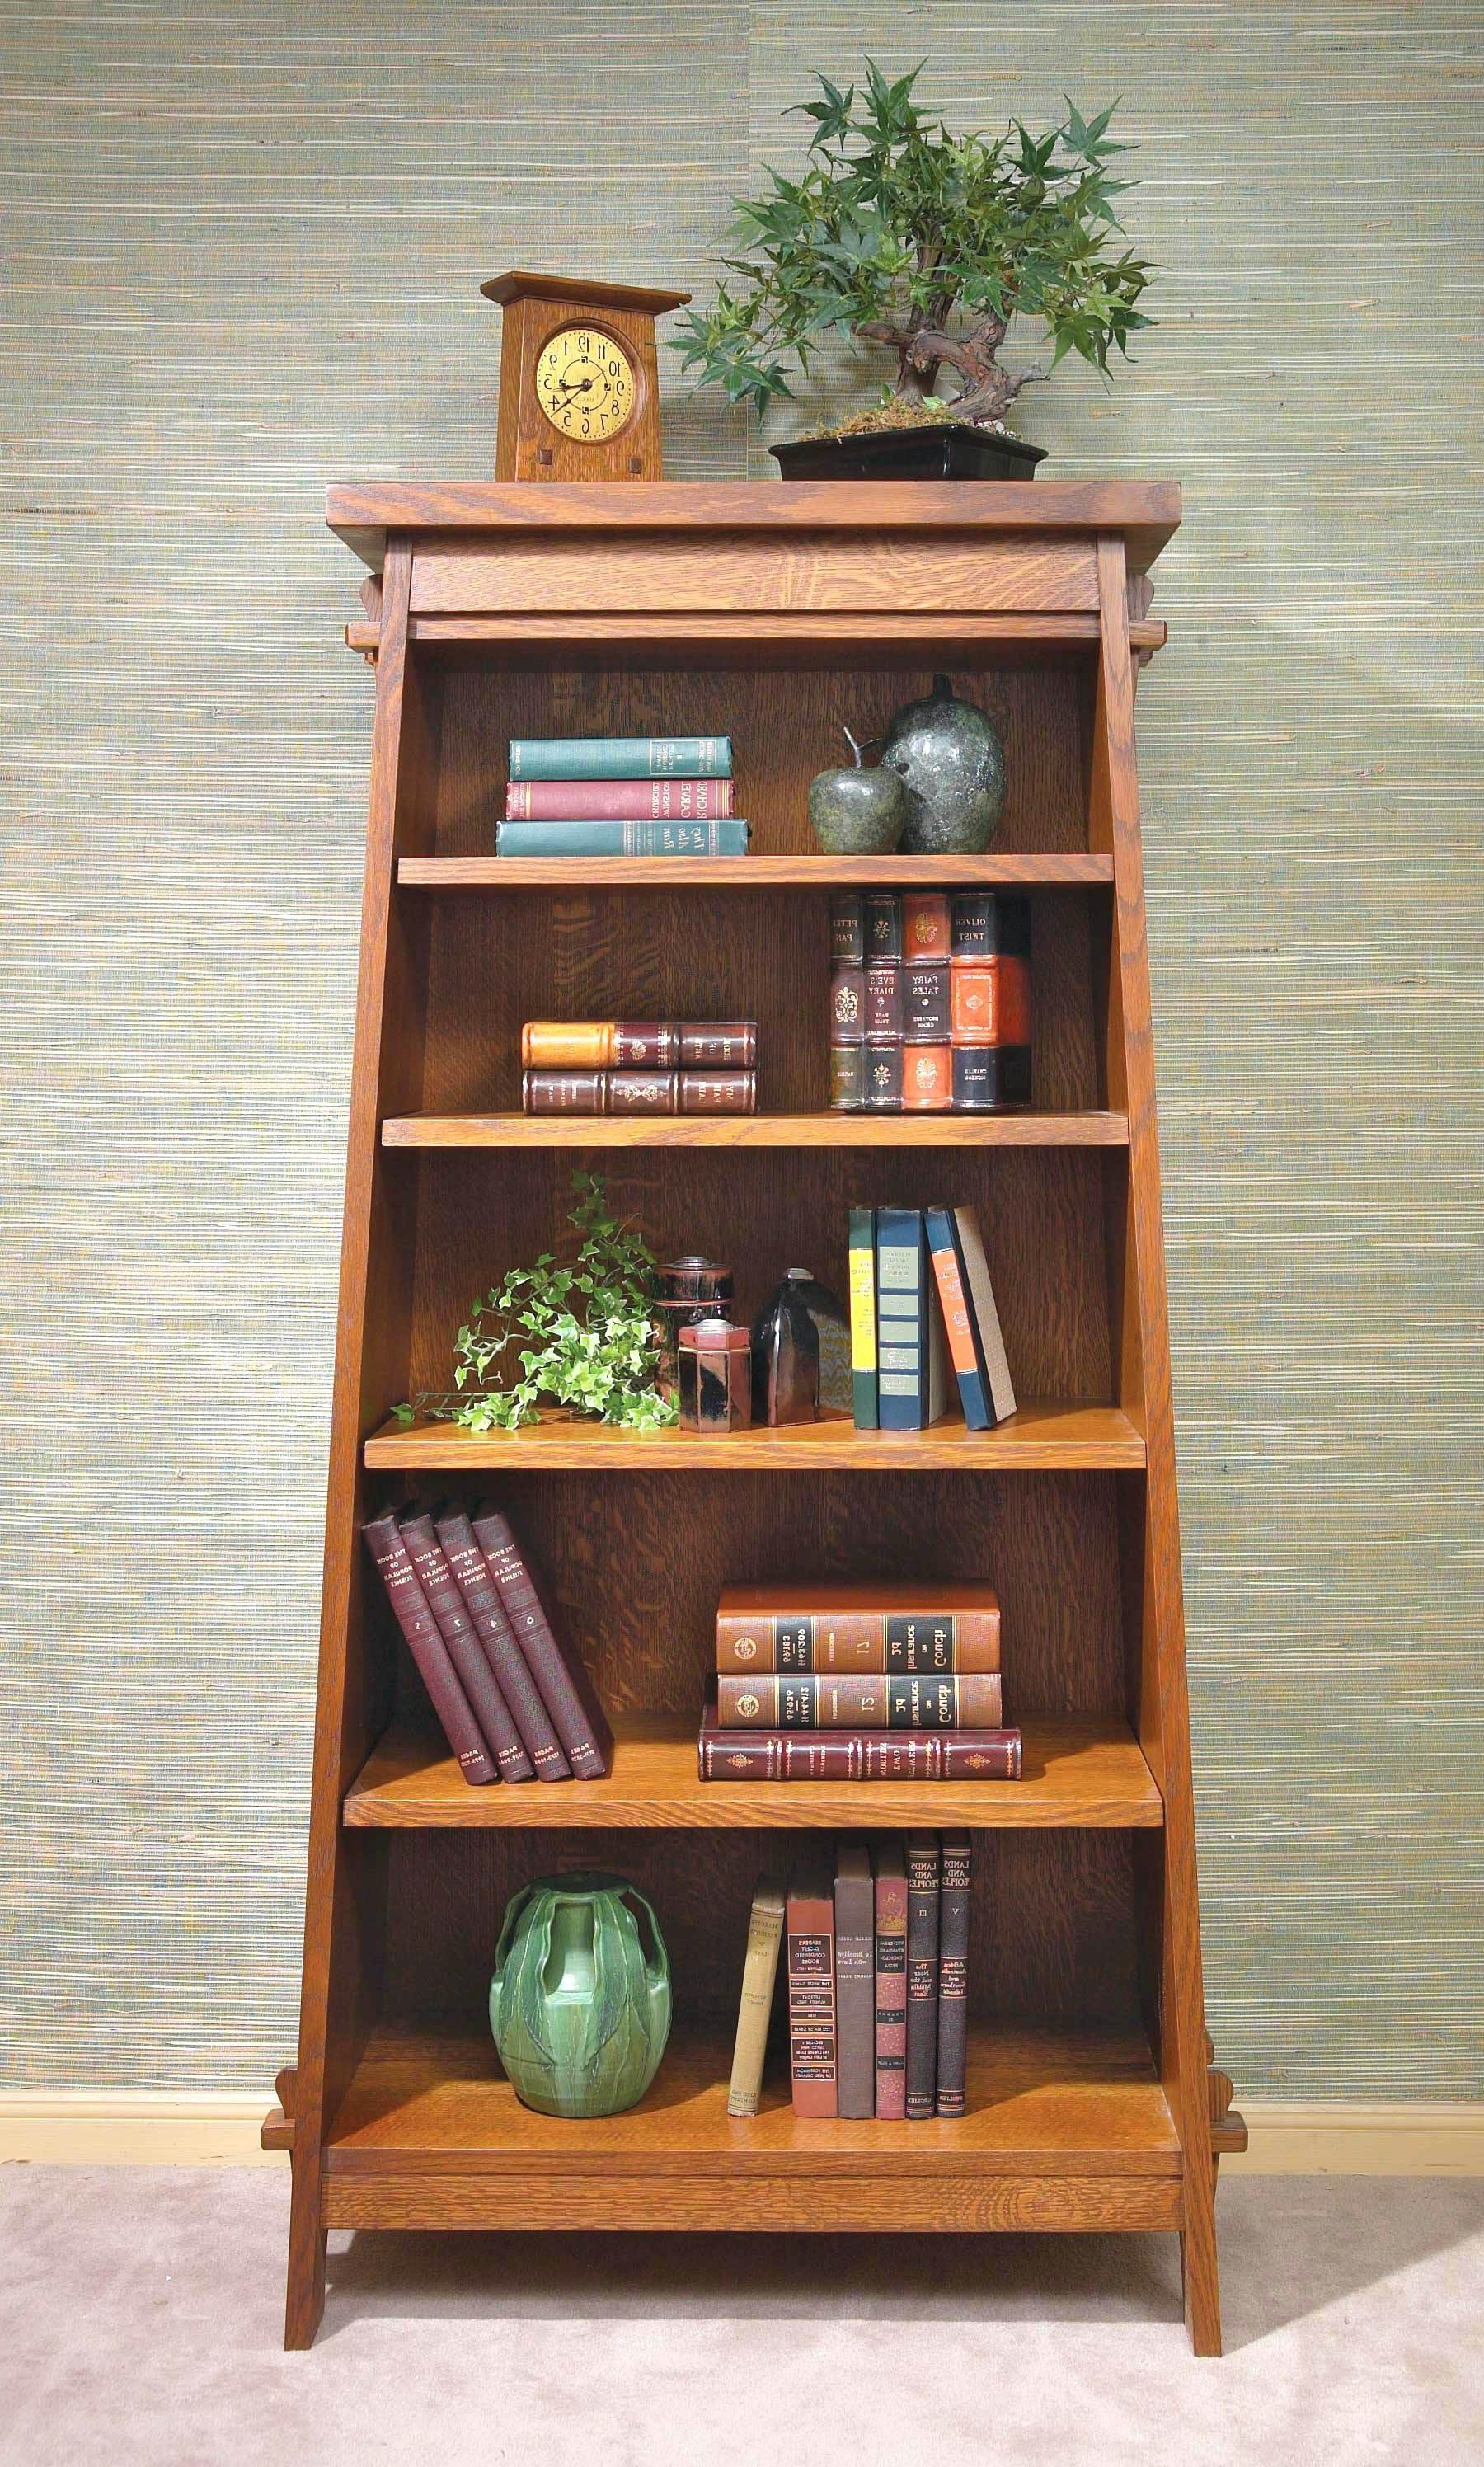 Latest Stickley Bookcase Gustav Stickley Bookcase Value Gustav Stickley For Craigslist Bookcases (View 10 of 15)